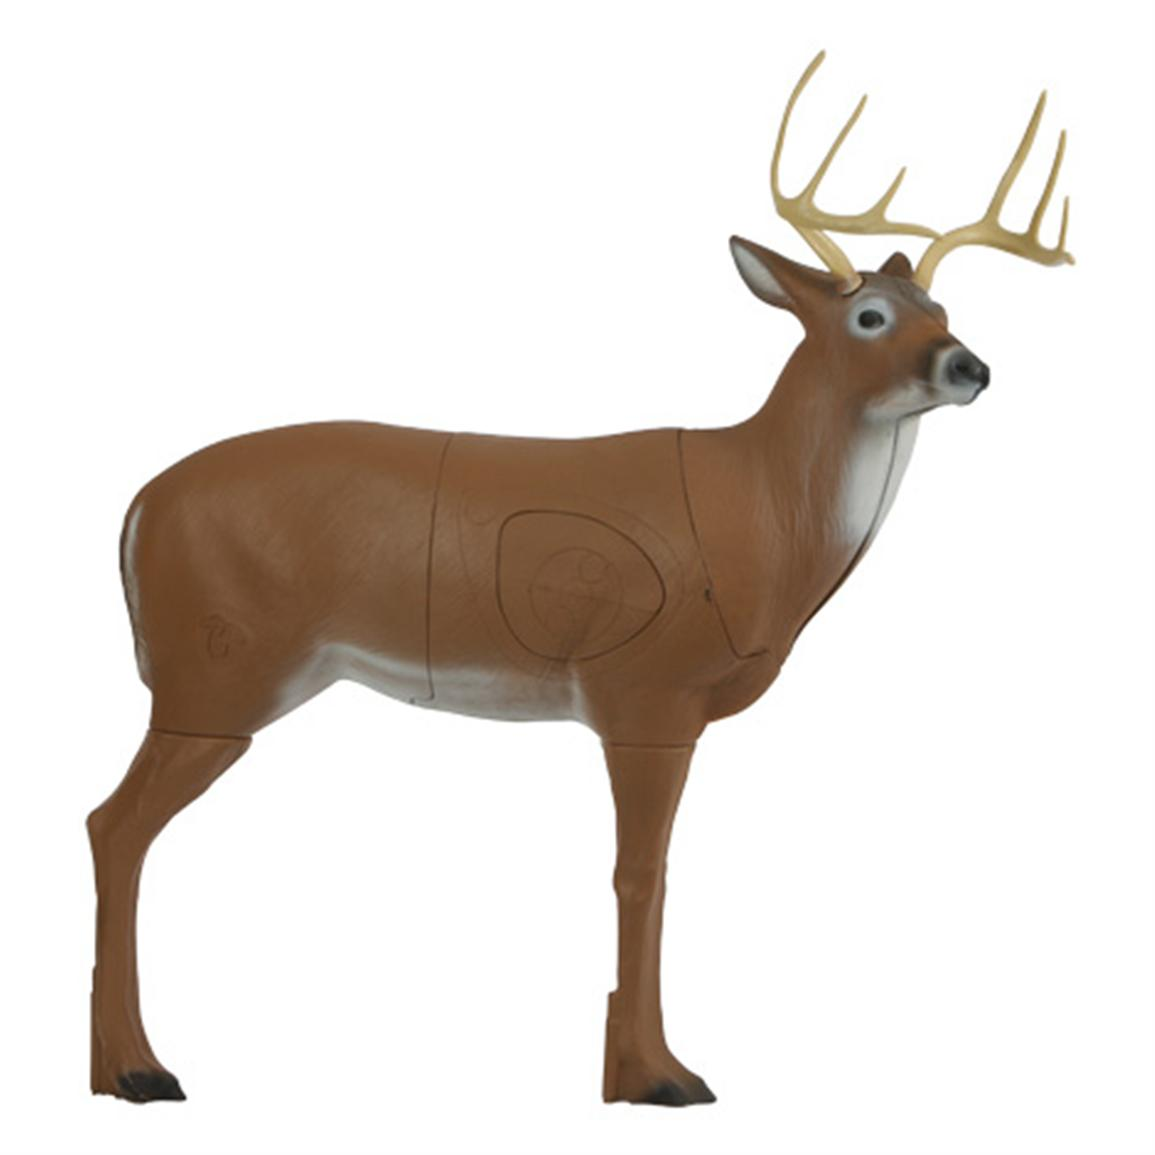 3d Deer Archery Target